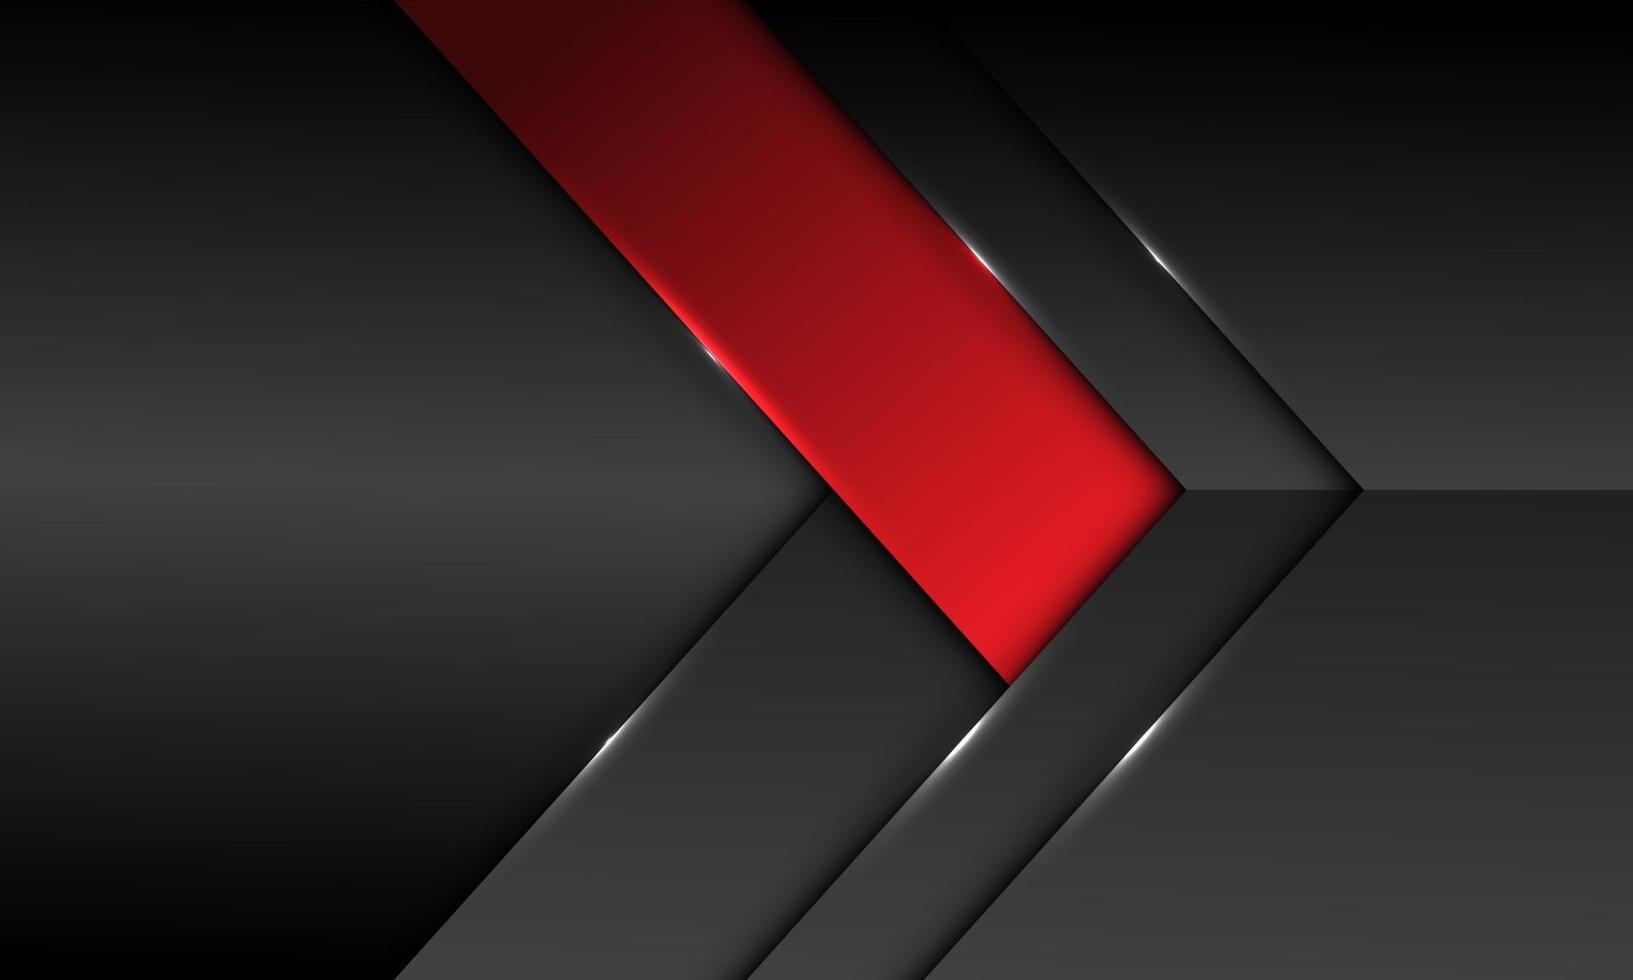 Dirección de flecha de banner rojo metálico gris oscuro abstracto con diseño de espacio en blanco moderno fondo futurista ilustración vectorial. vector